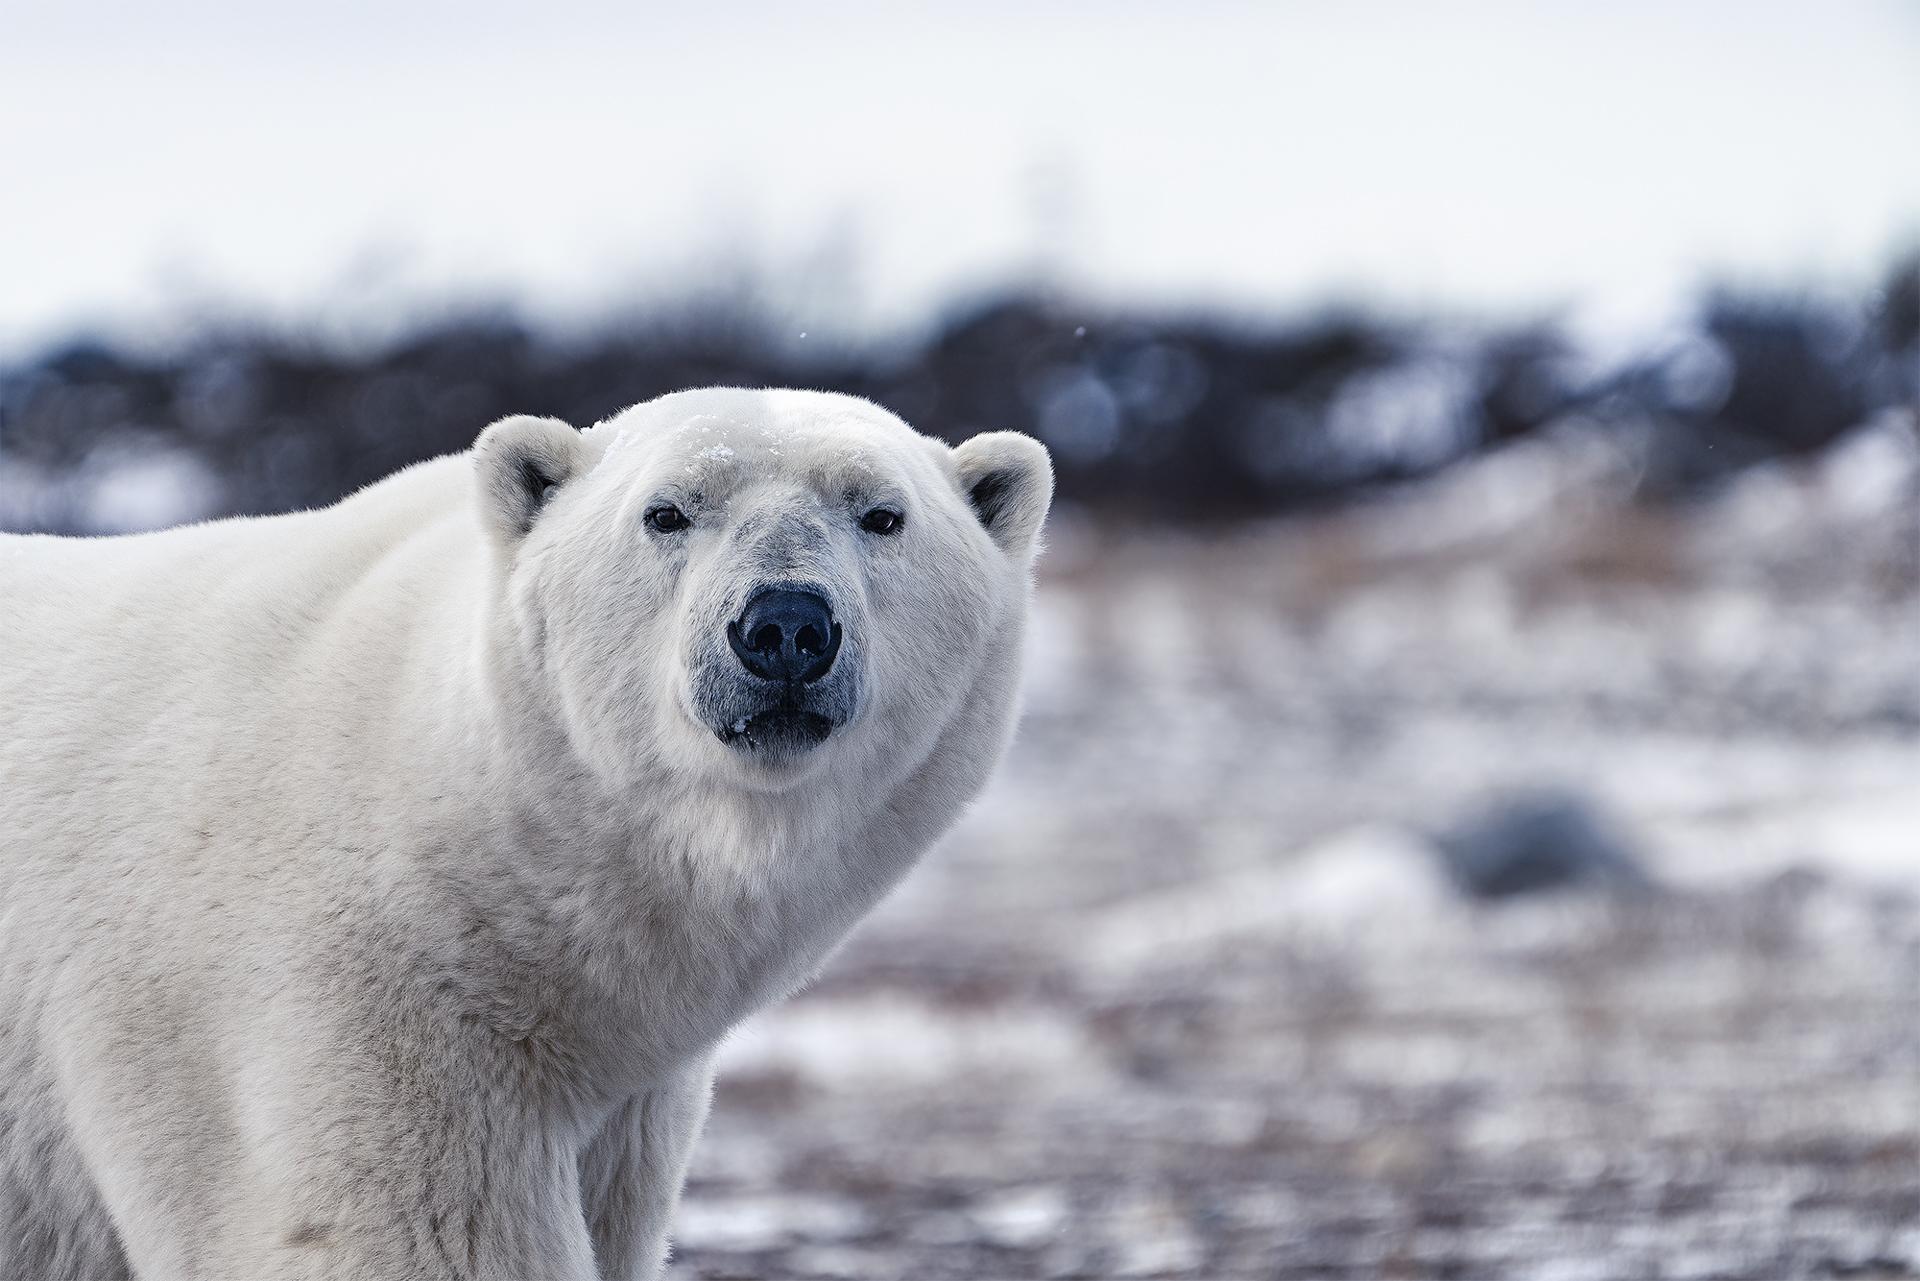 Ankit_Kumar_Polar_Bear_Stare.jpg